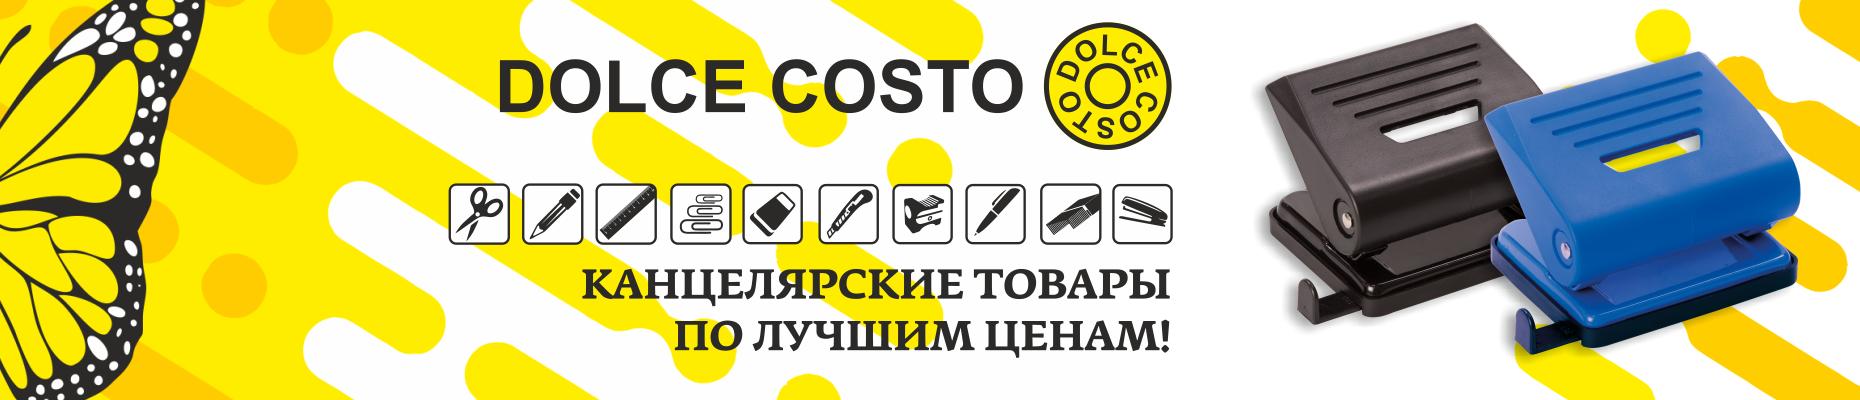 Dolce Costo - канцелярские товары по лучшим ценам!